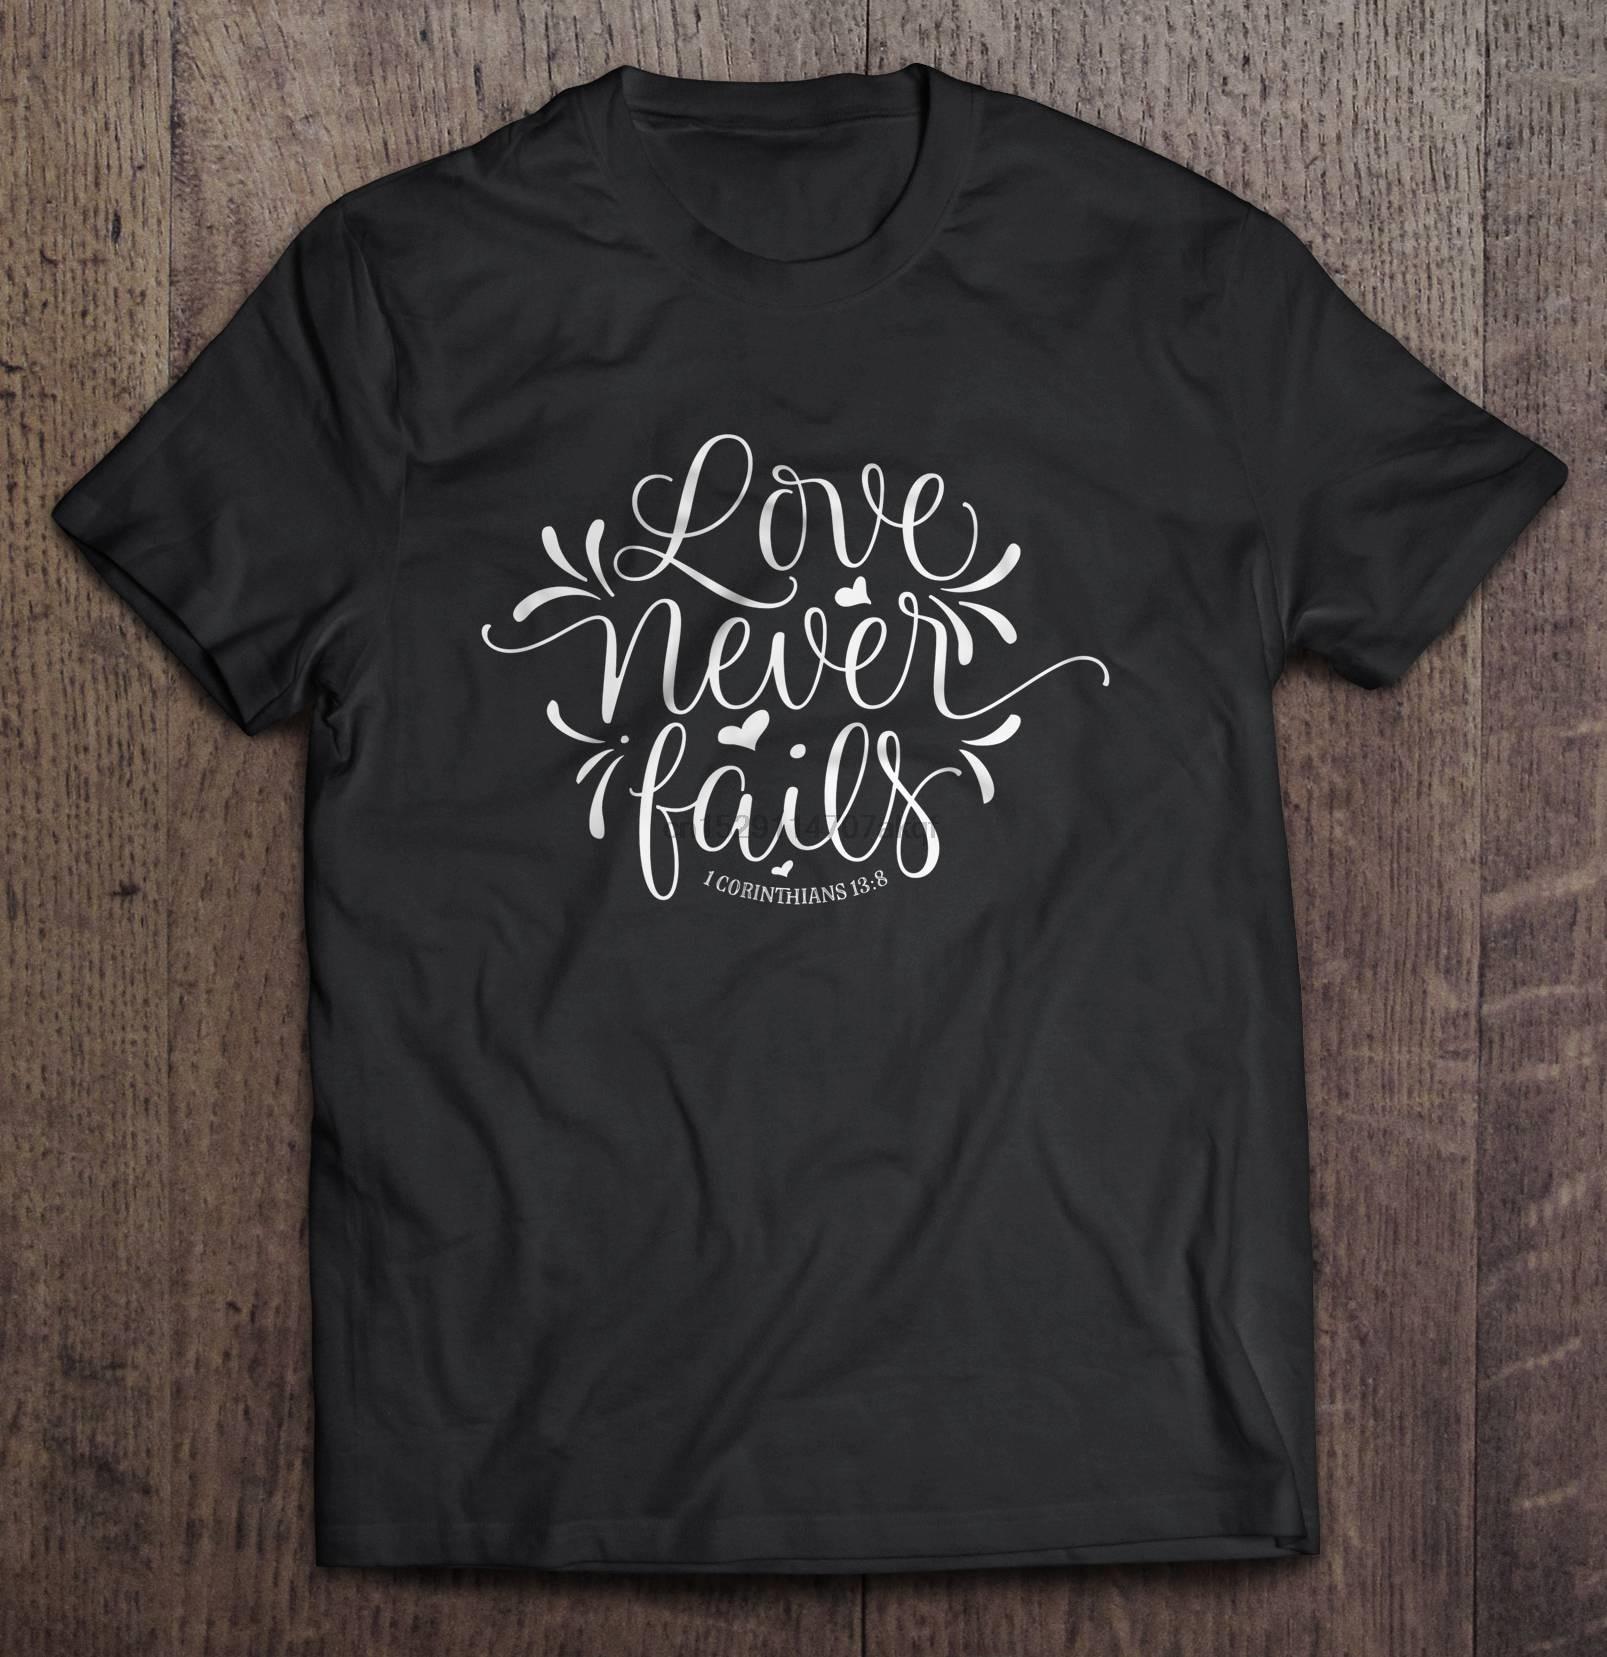 Men Funny T Shirt Fashion tshirt Love Never Fails 1 Corinthians 138 Women t-shirt